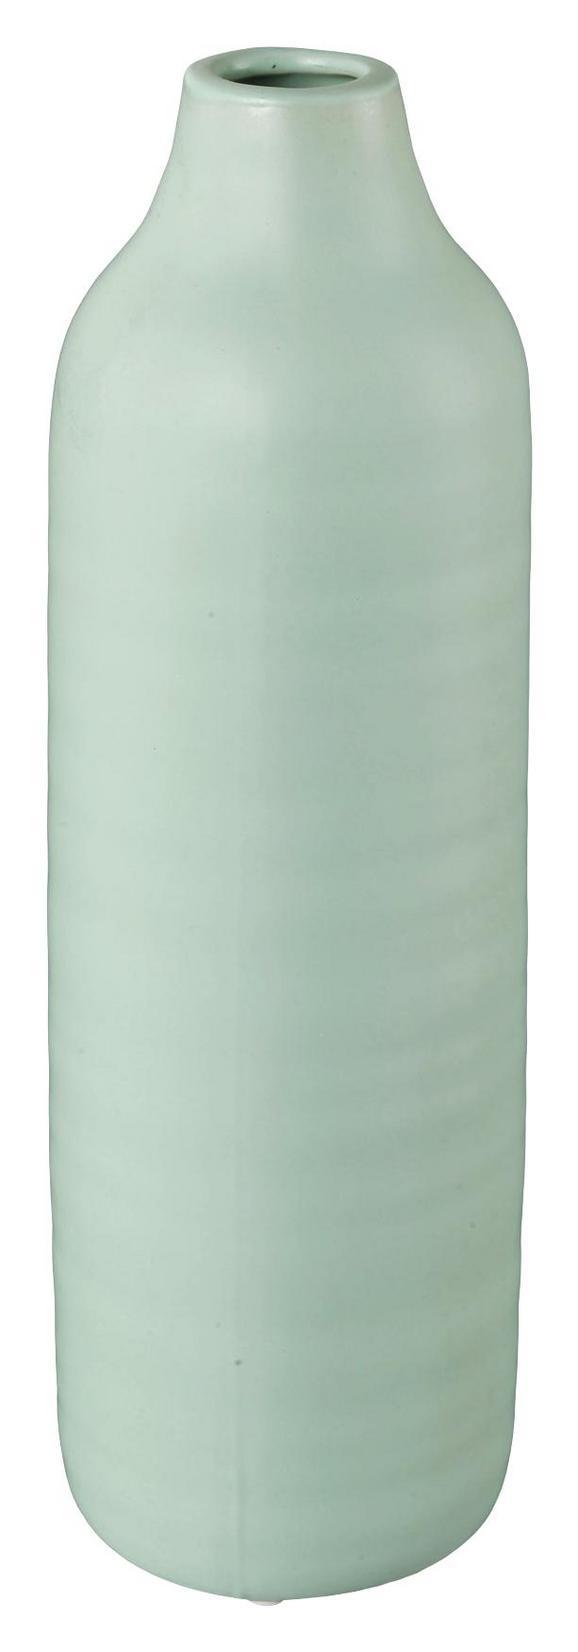 Dekovase Presence Grün 10x30 cm - Grün, LIFESTYLE, Keramik (10/30cm)